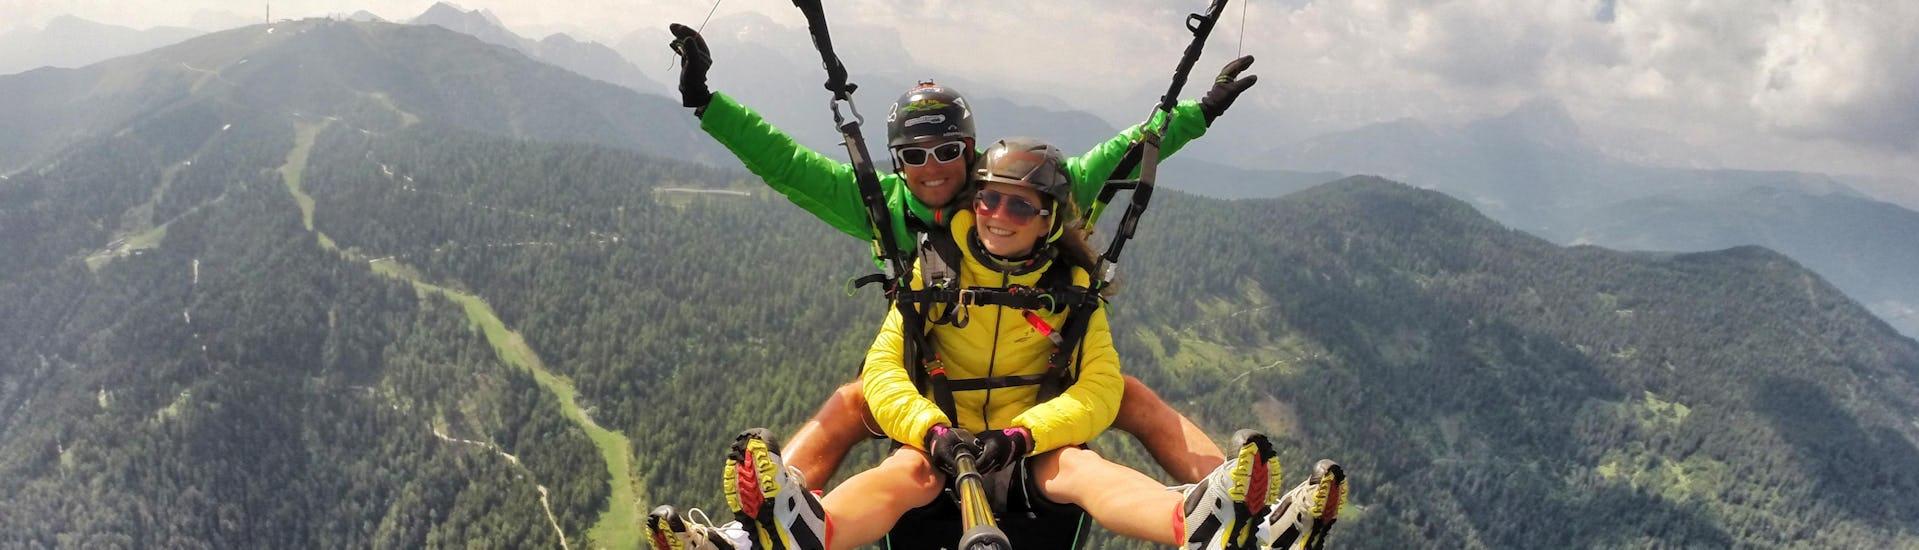 "Tandem Paragliding ""Kronfly"" - Monte Spico"